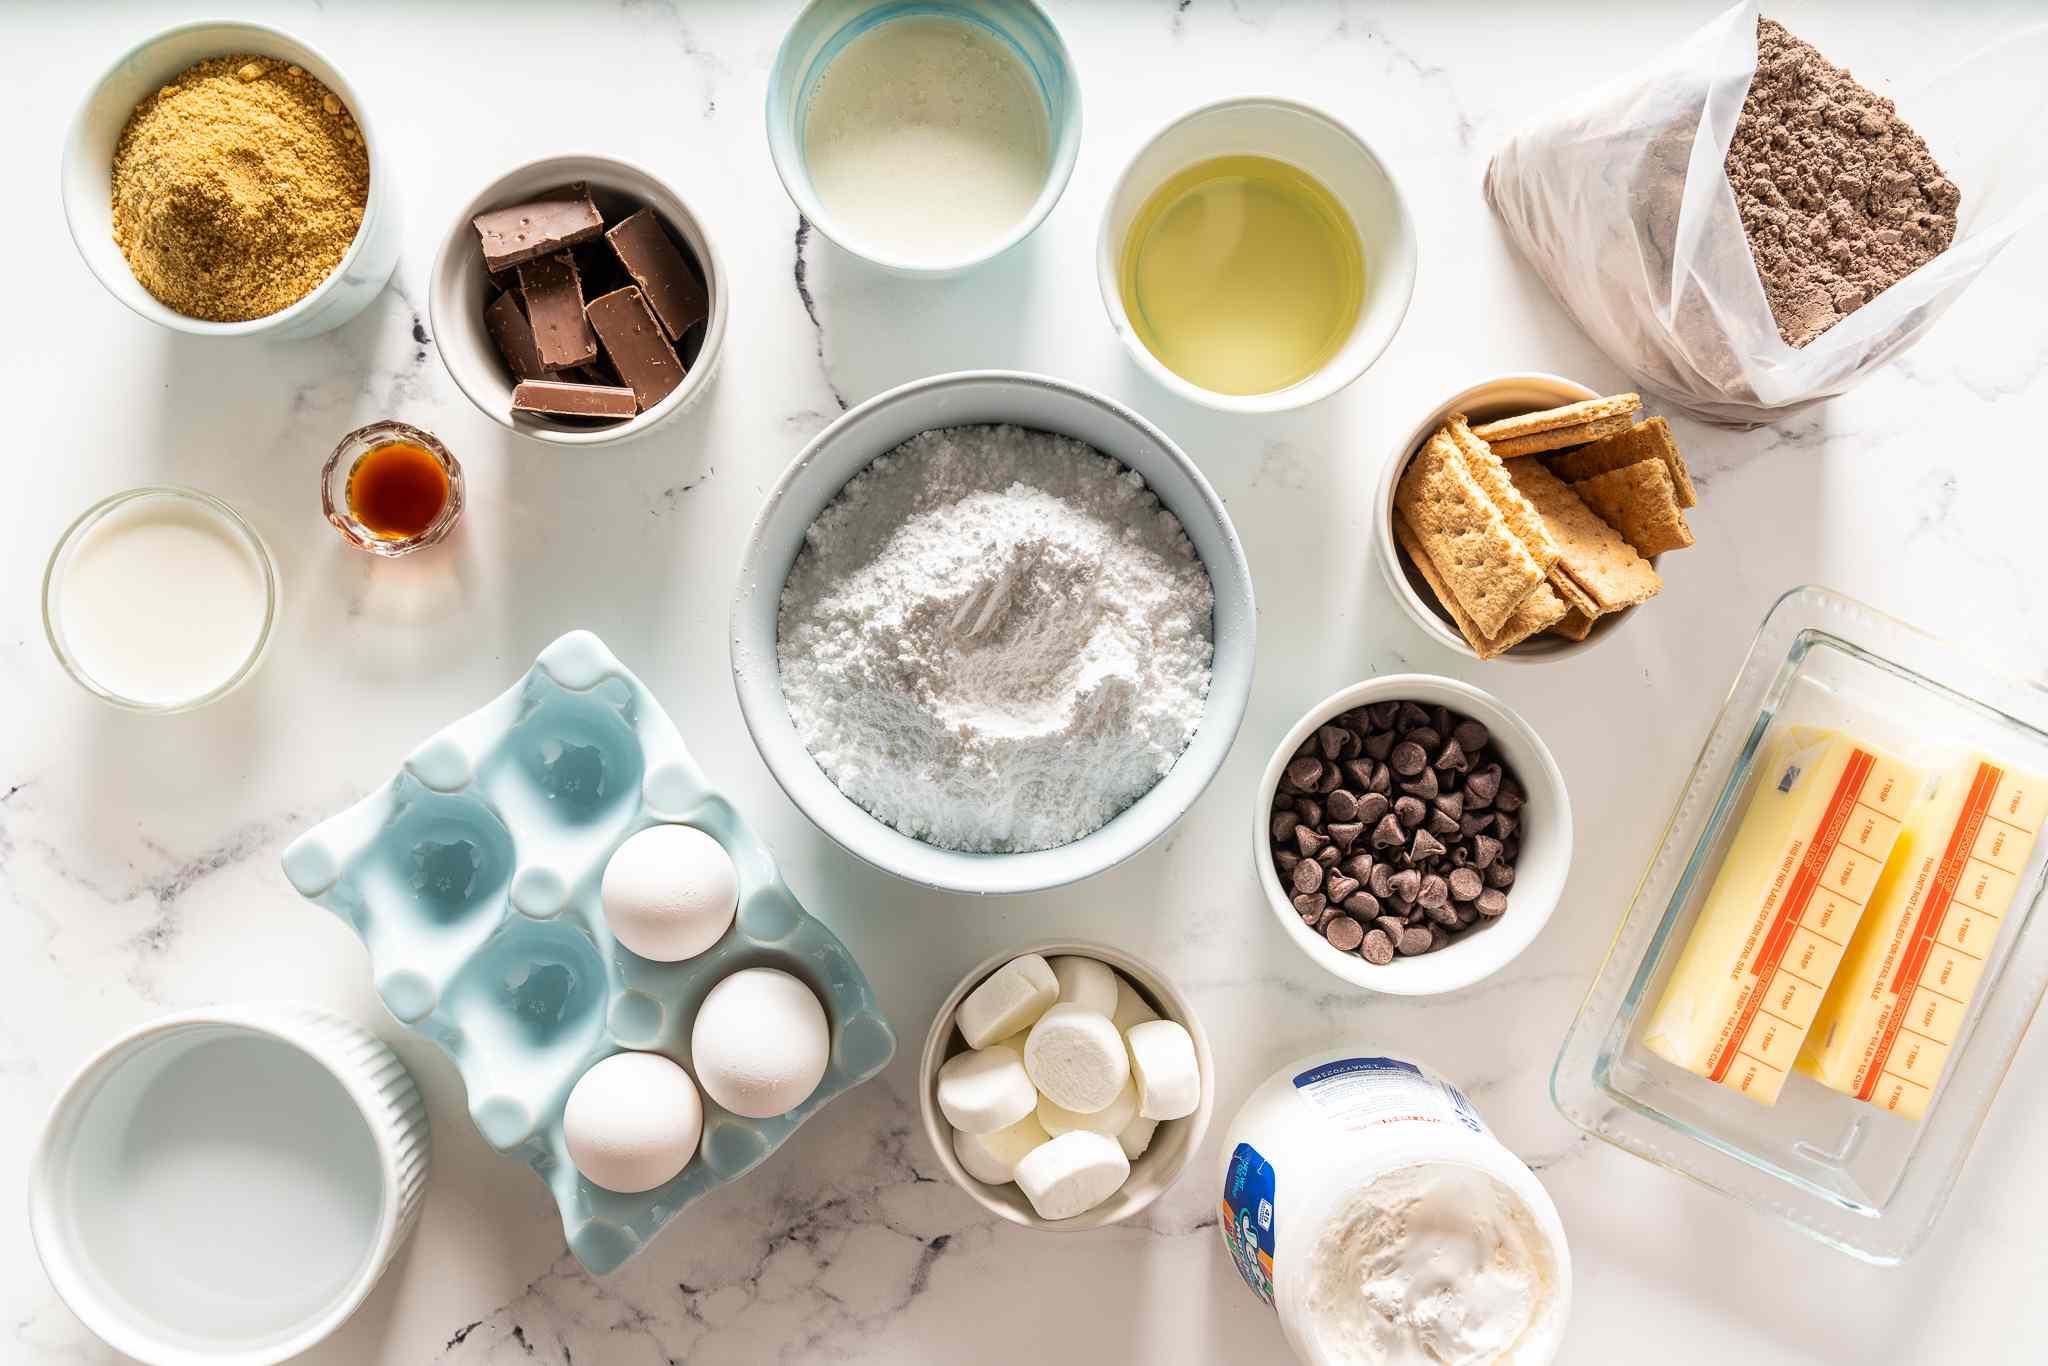 S'mores Cake ingredients